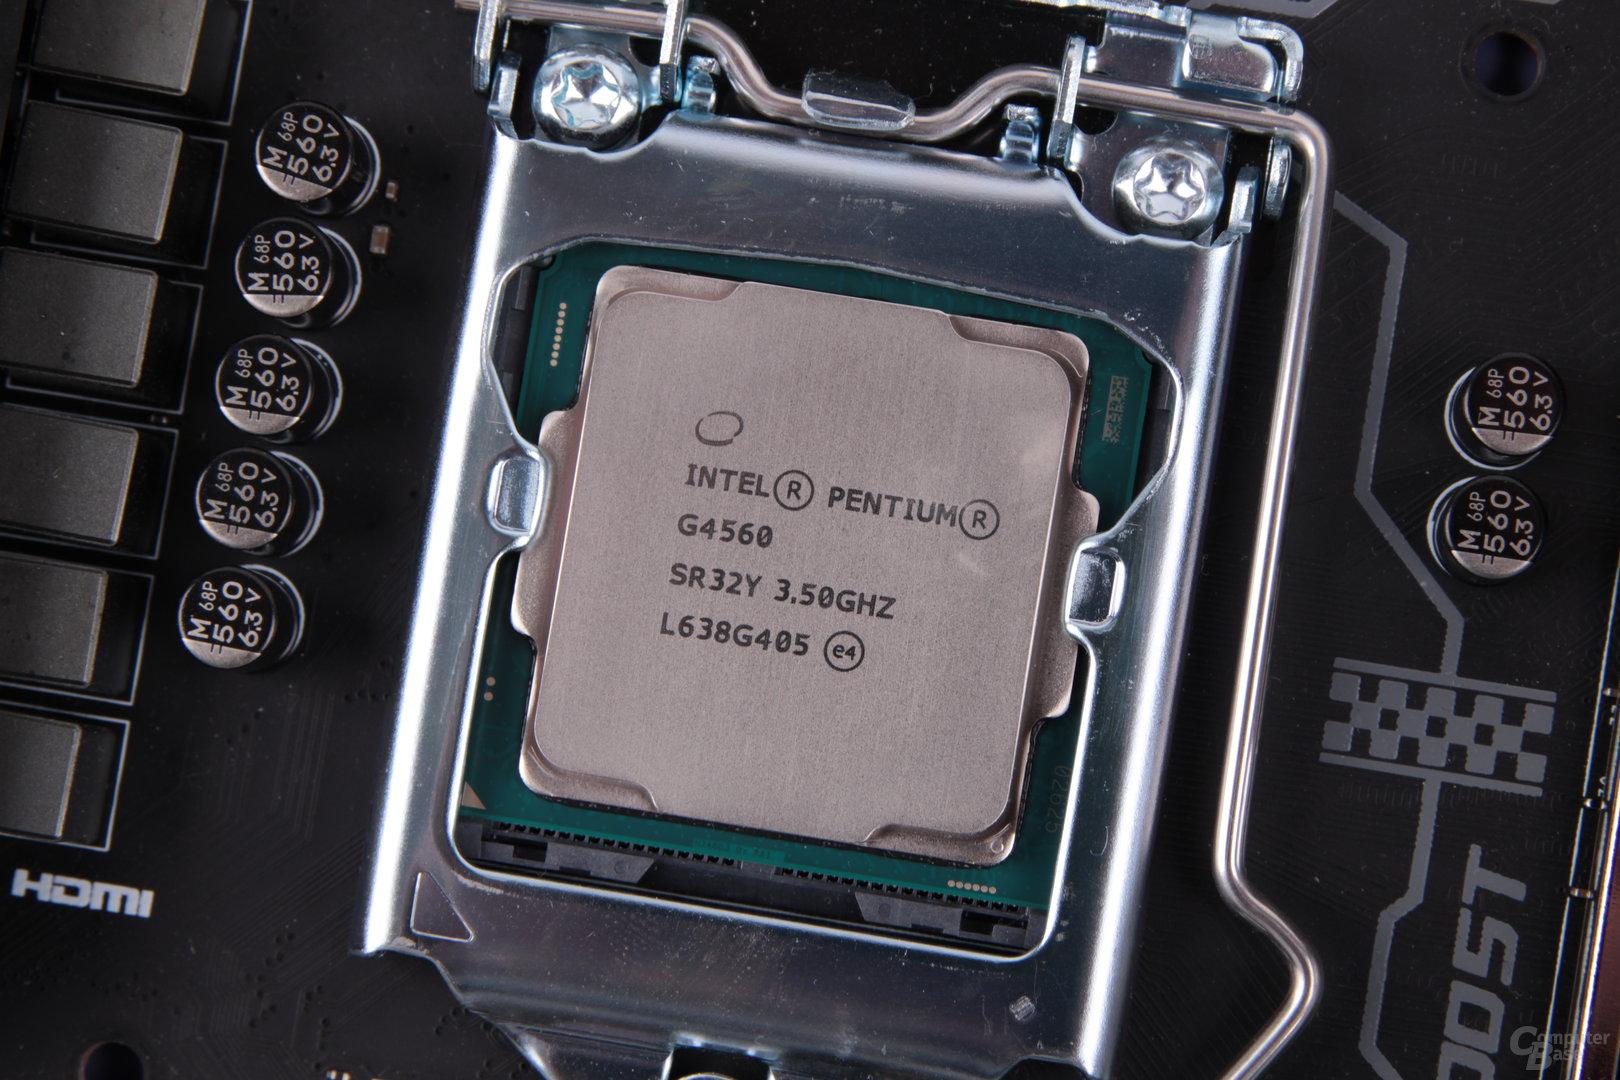 Intel-Pentium-G4560-Processor.jpg